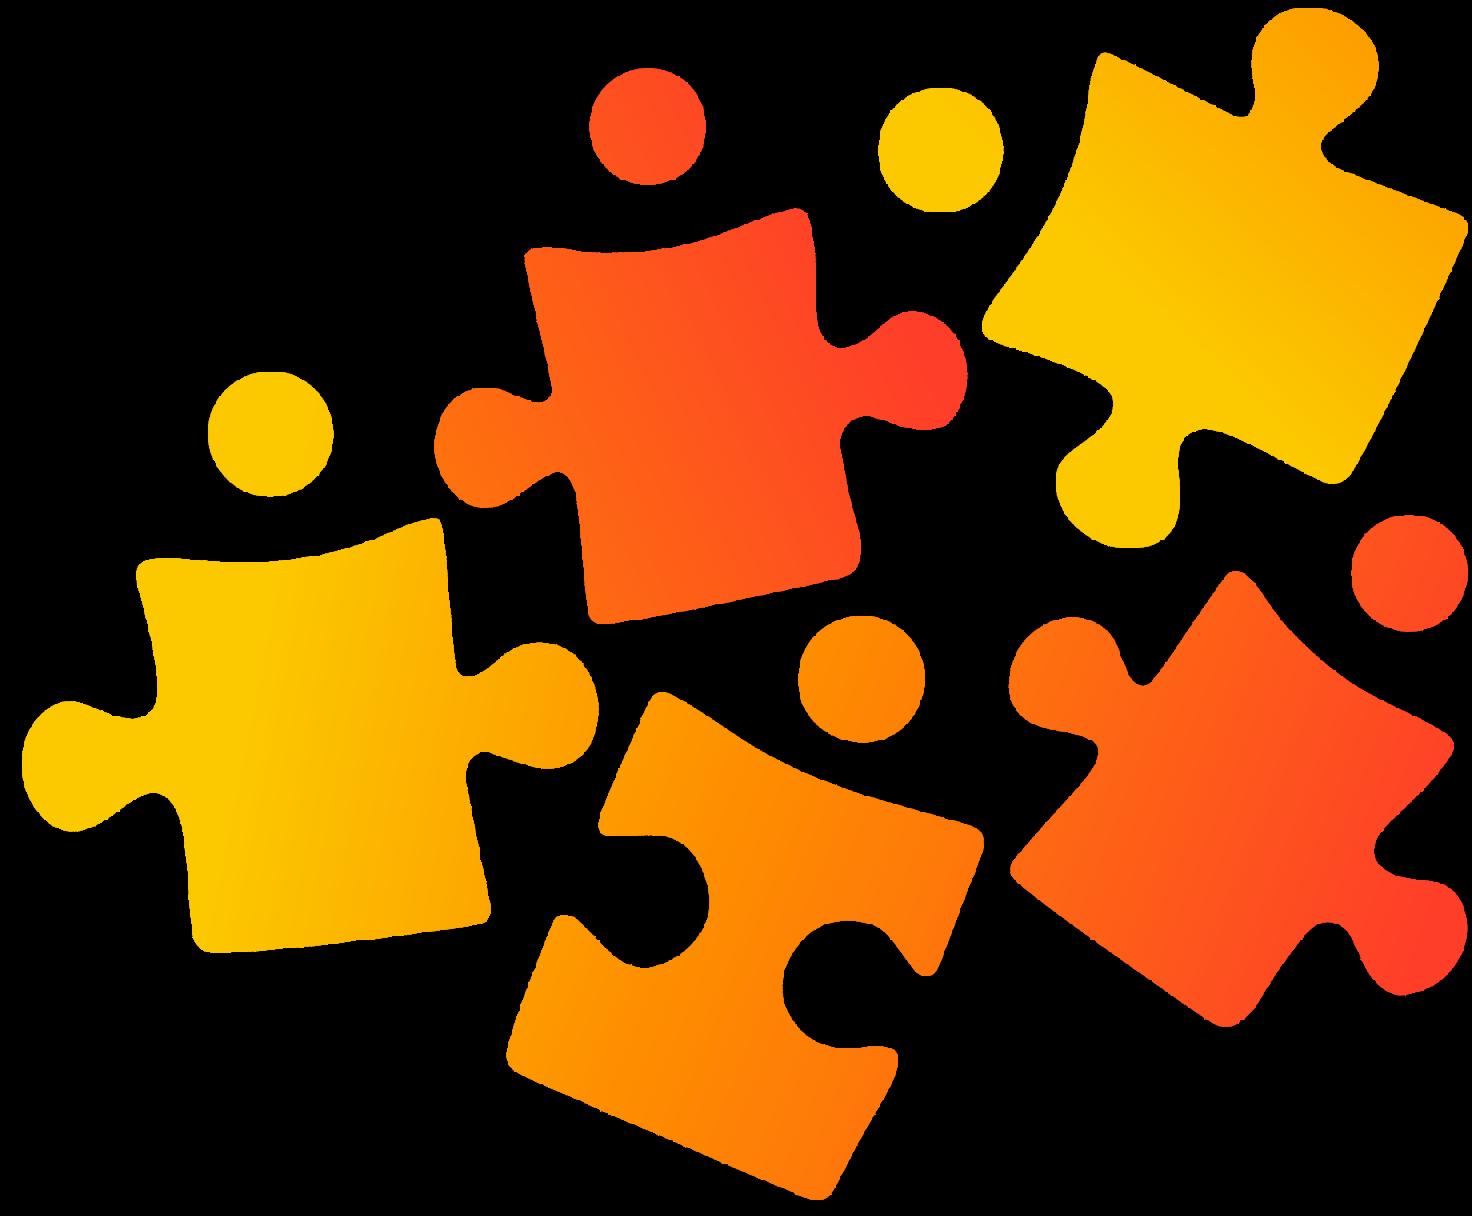 Puzzle Mareike E. Schmid